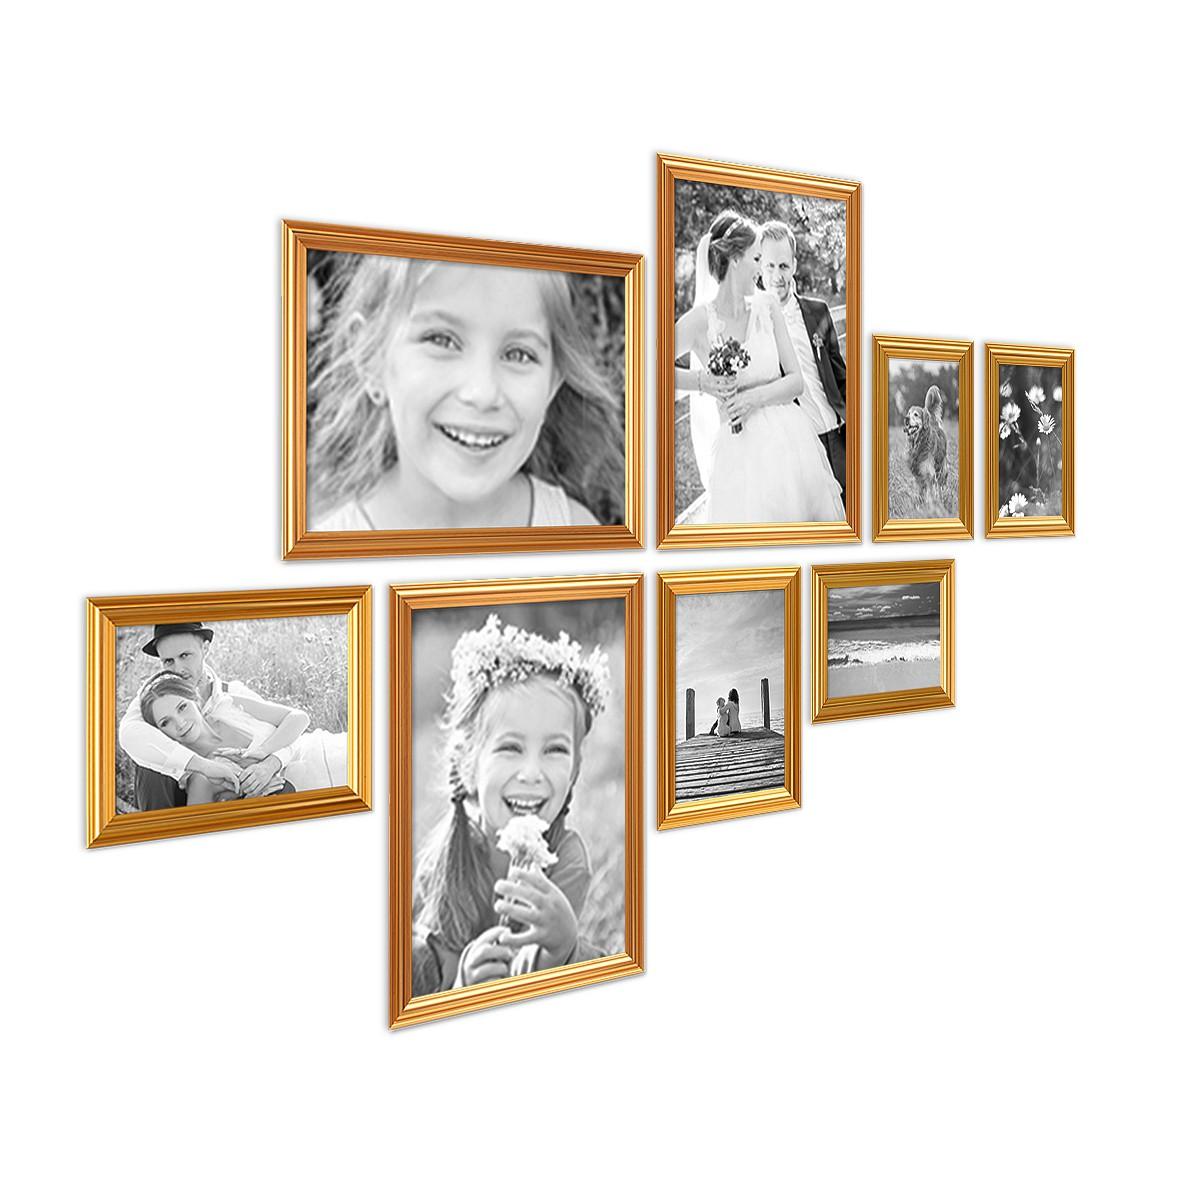 8er Bilderrahmen-Set Gold Barock Antik aus Kunststoff inklusive ...